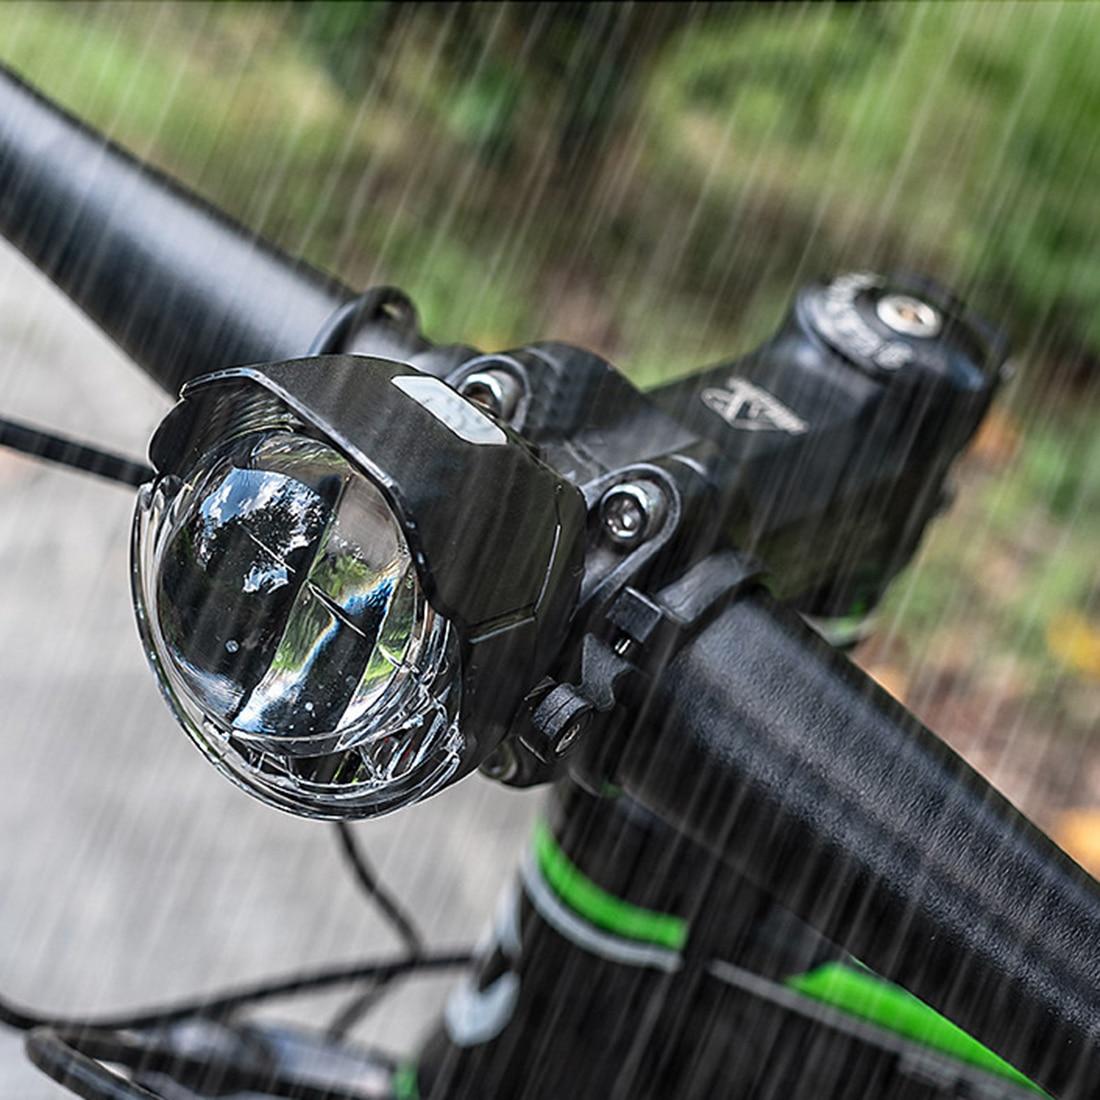 USB Rechargeable T6 LED Bicycle Bike Front Head Light Headlight Lamp Rainproof